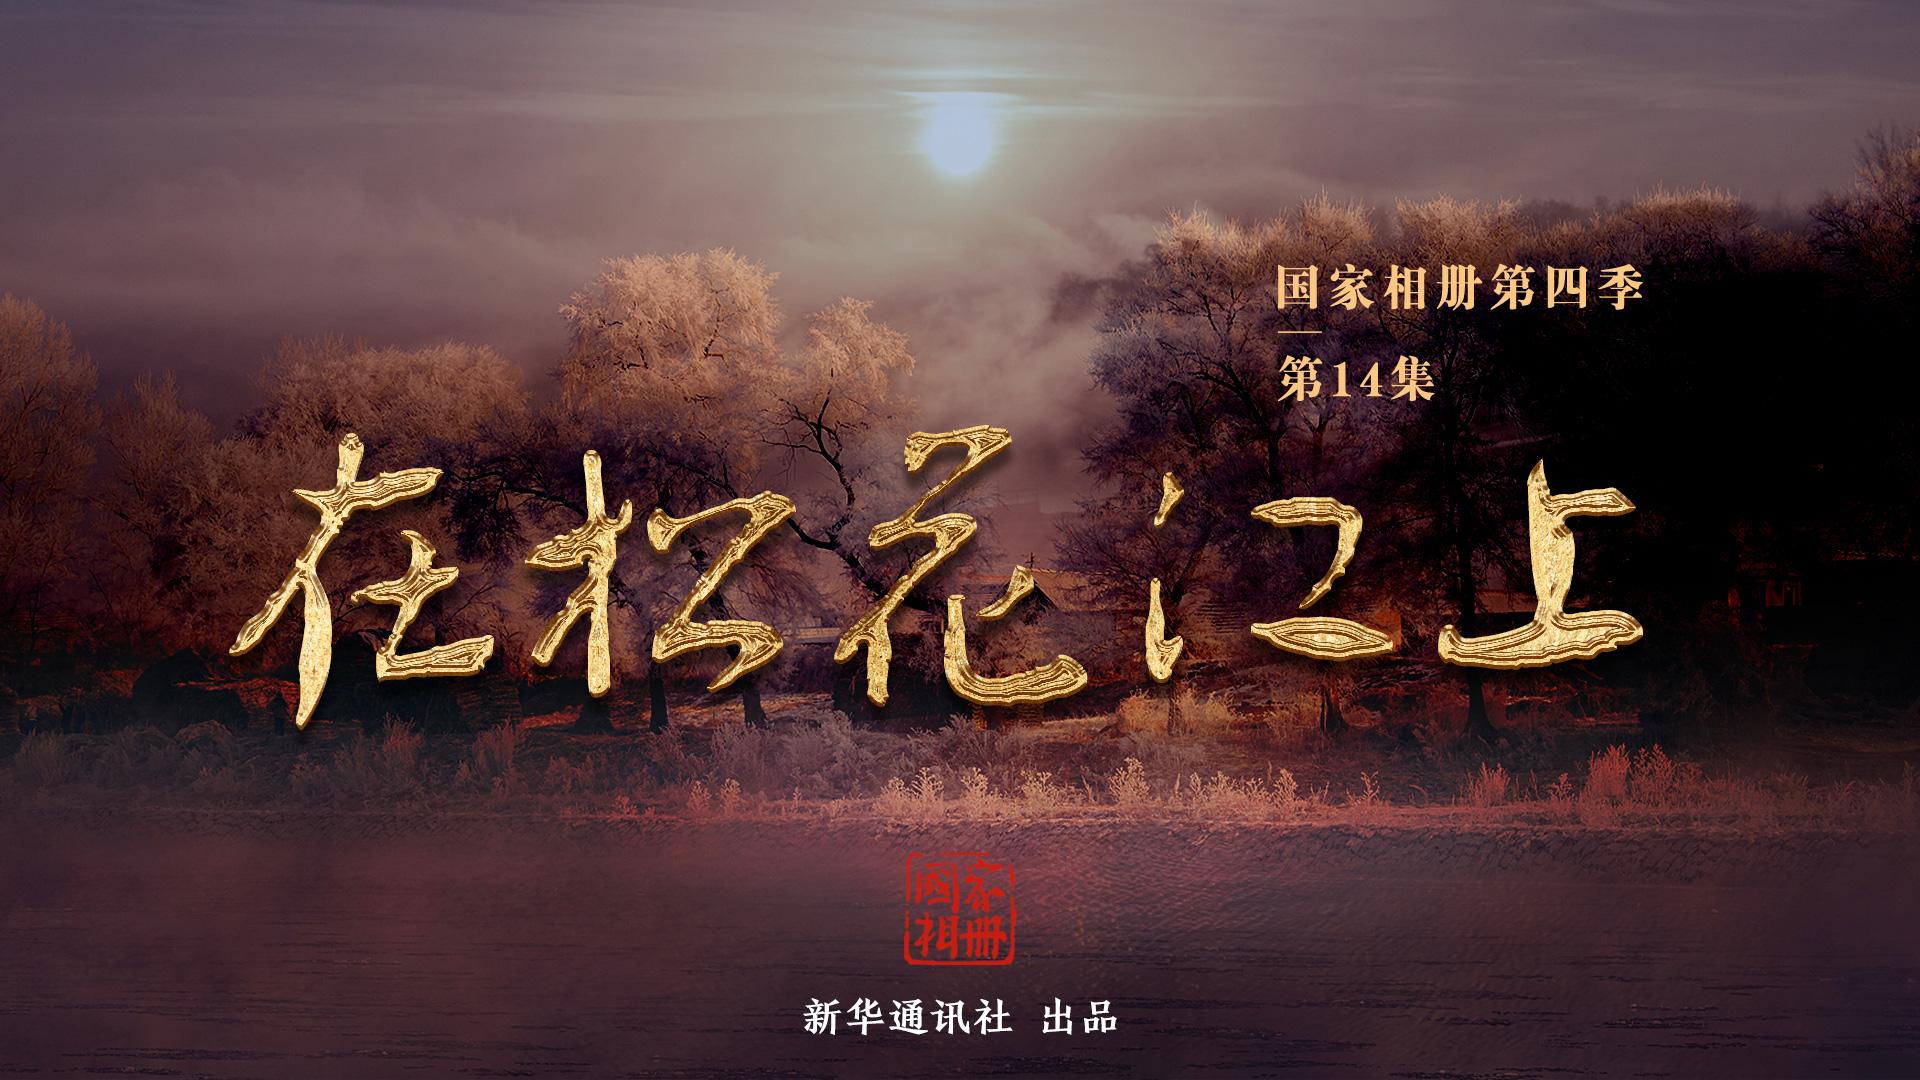 國家相冊(ce)第(di)四季第(di)14集《在松花江上》